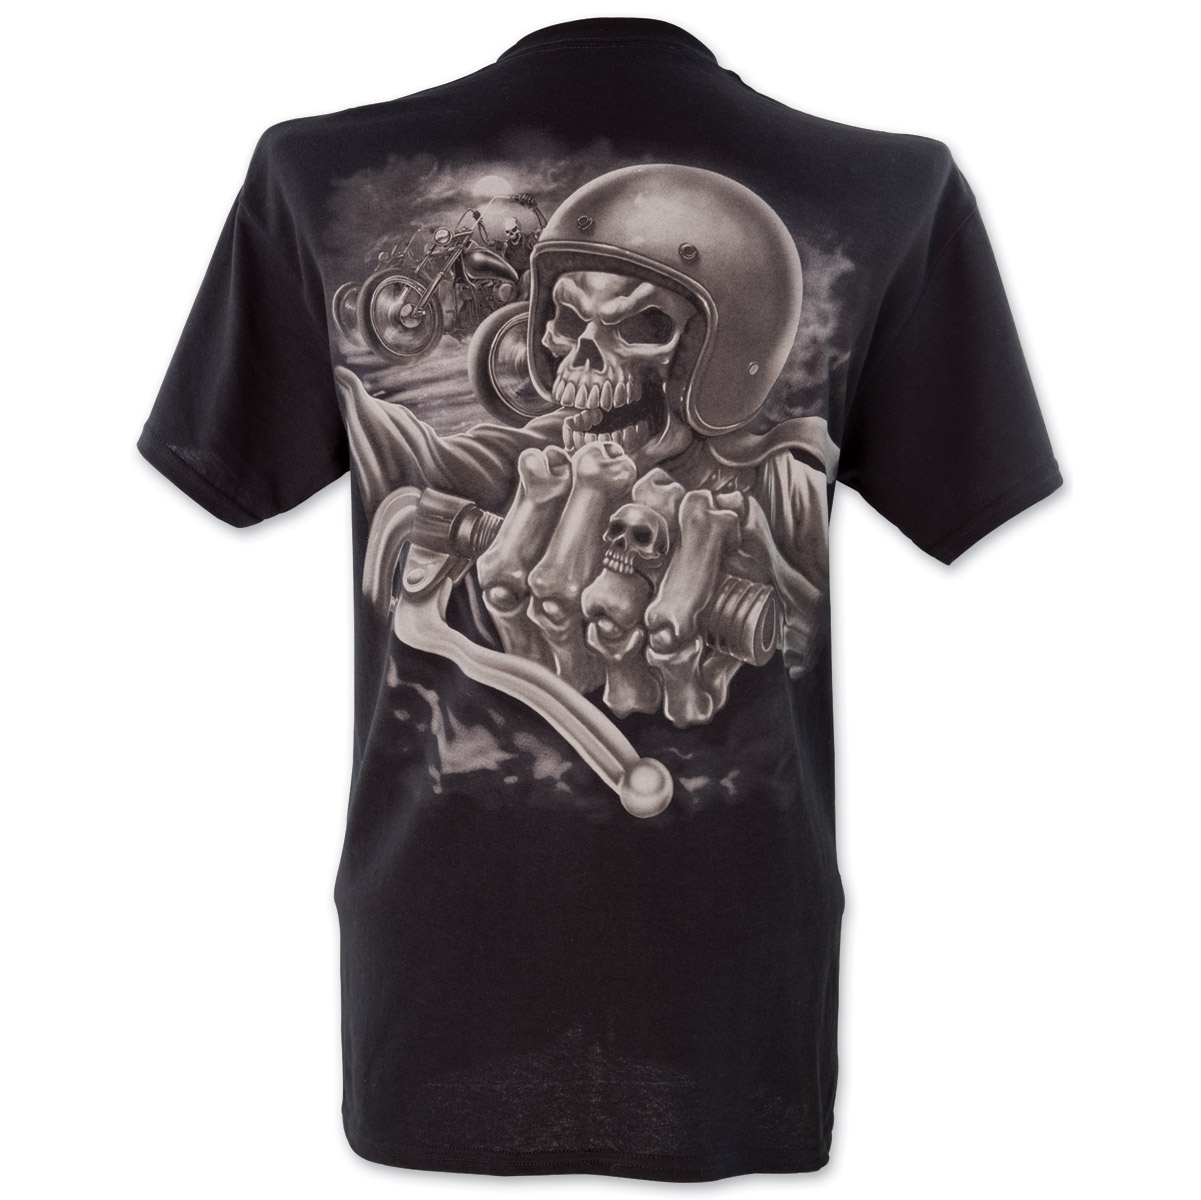 Black t shirt skull - Lethal Threat Skull Crew Black T Shirt